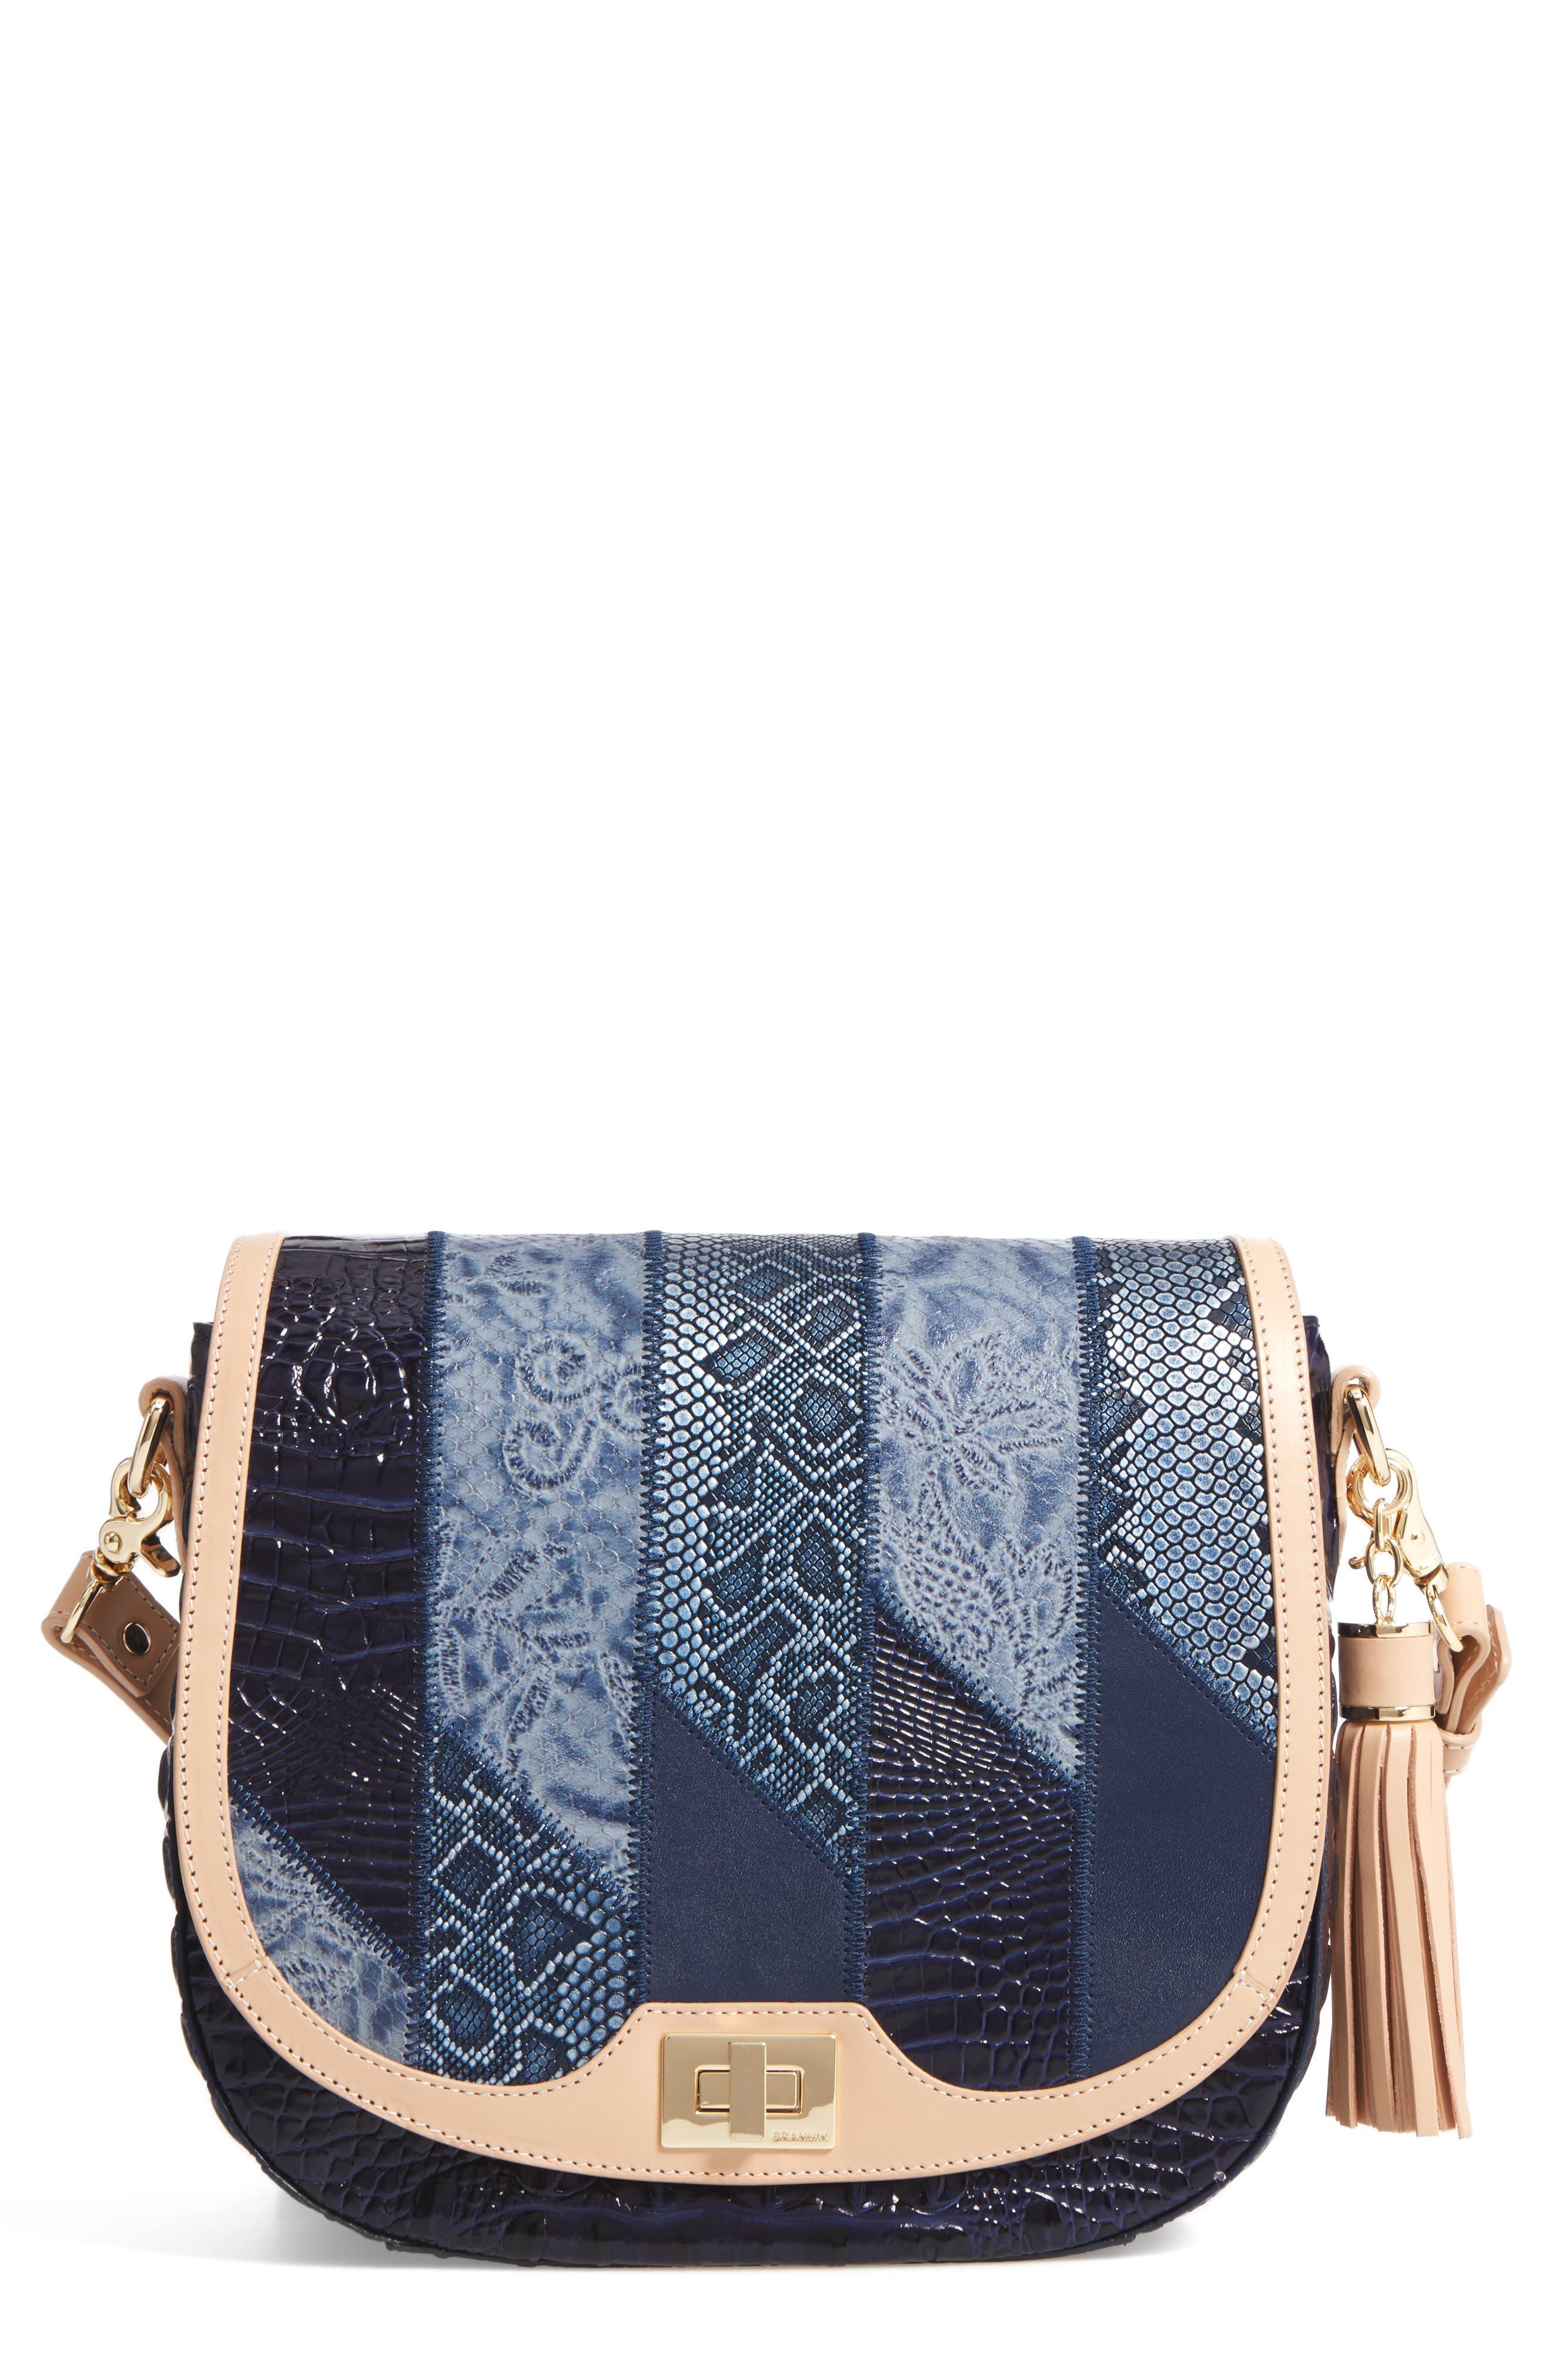 Brahmin Sonny Crossbody Bag